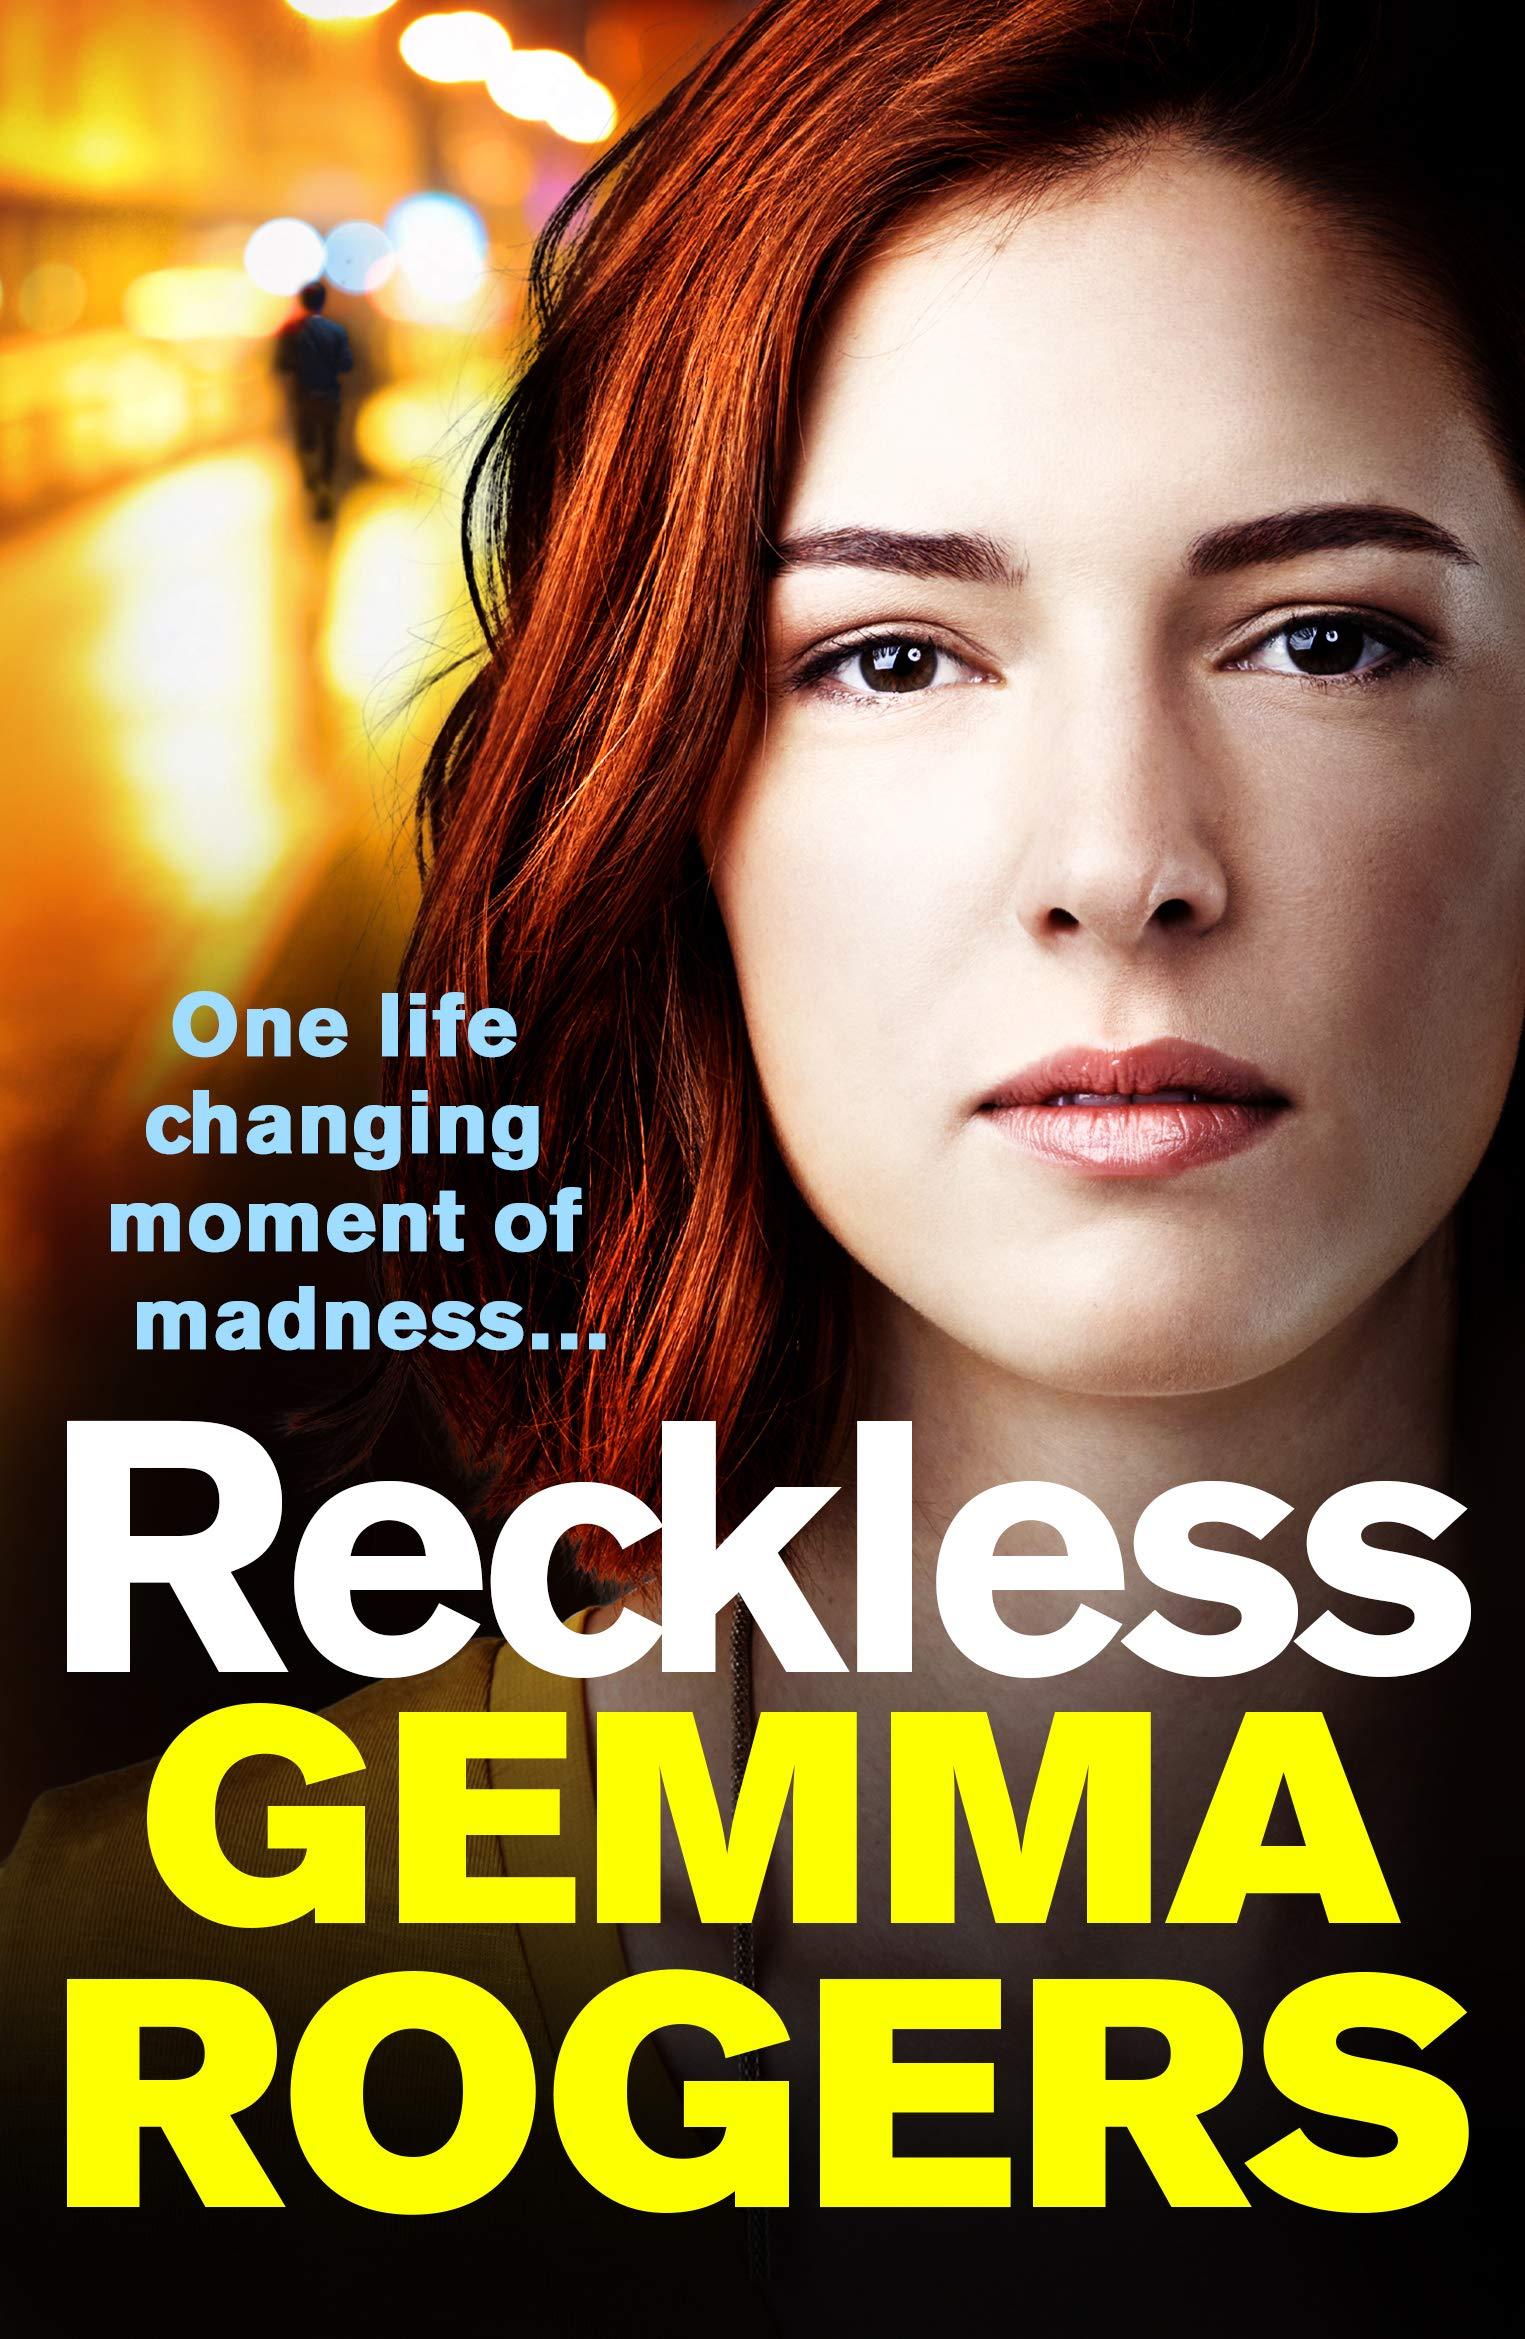 Reckless: A gritty, addictive thriller